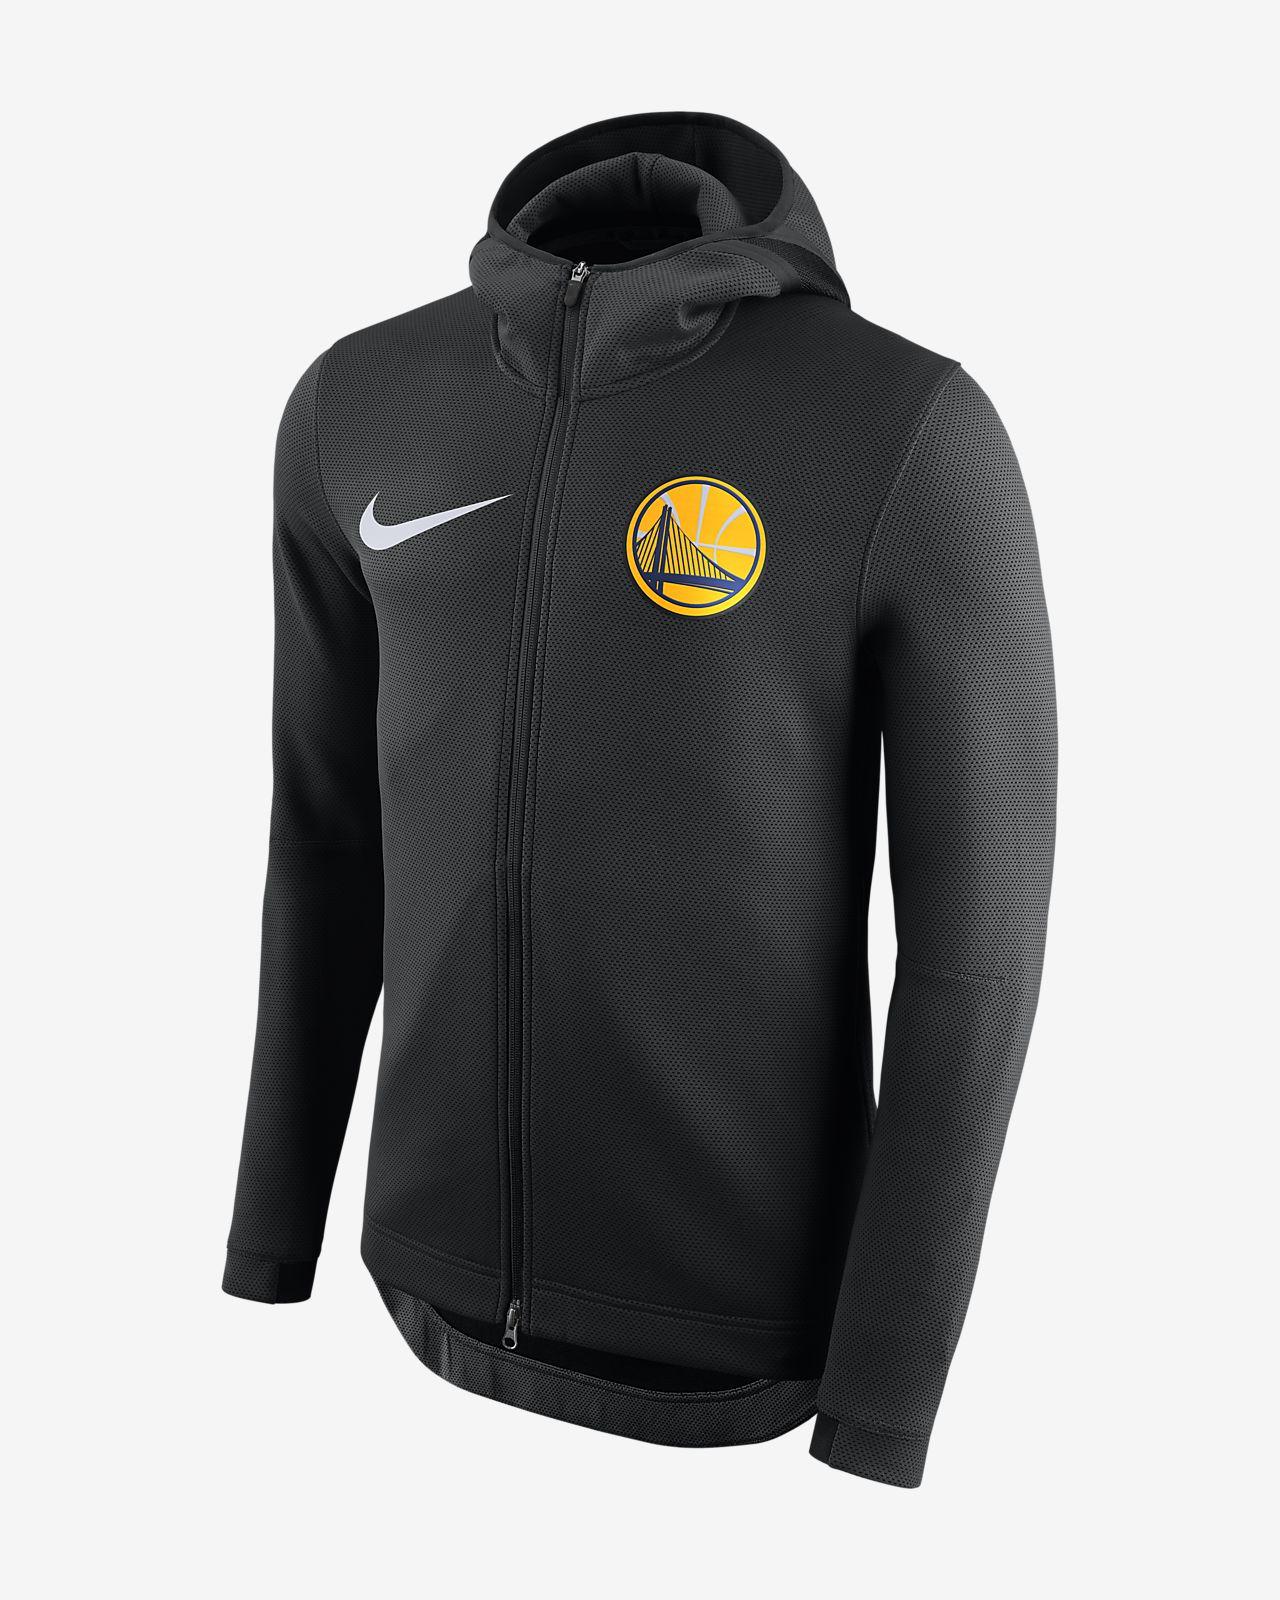 0bb501b0535 Golden State Warriors Nike Therma Flex Showtime Men s NBA Hoodie ...